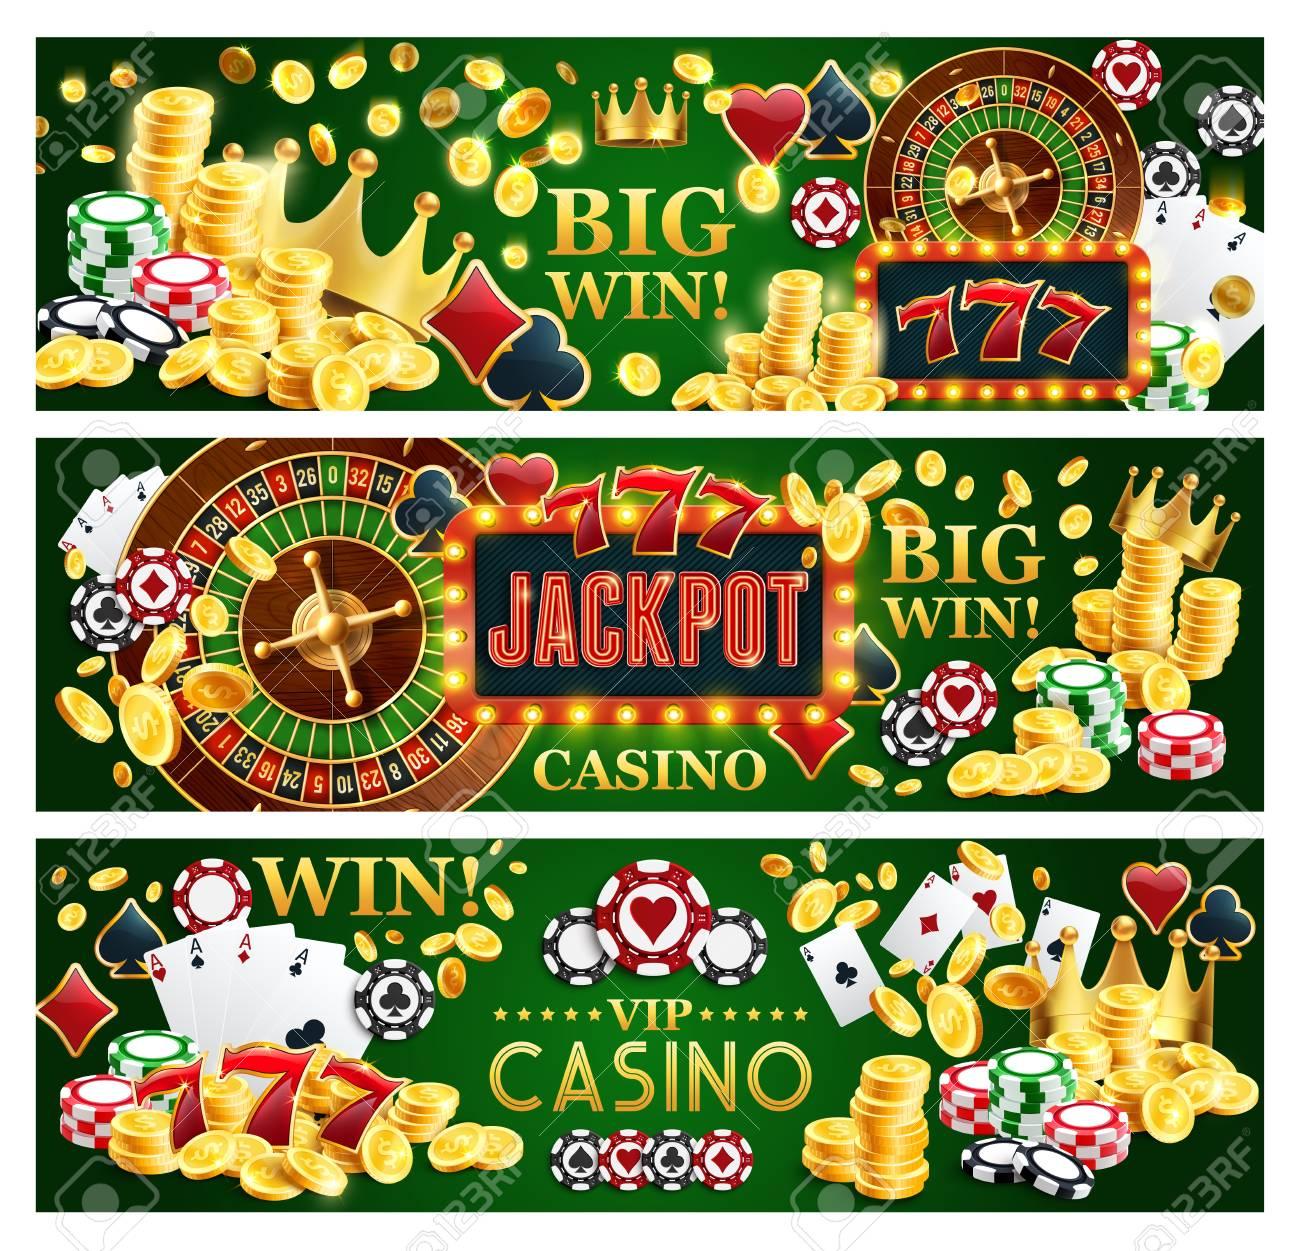 Online casino jackpot gamble game banners, Internet gambling